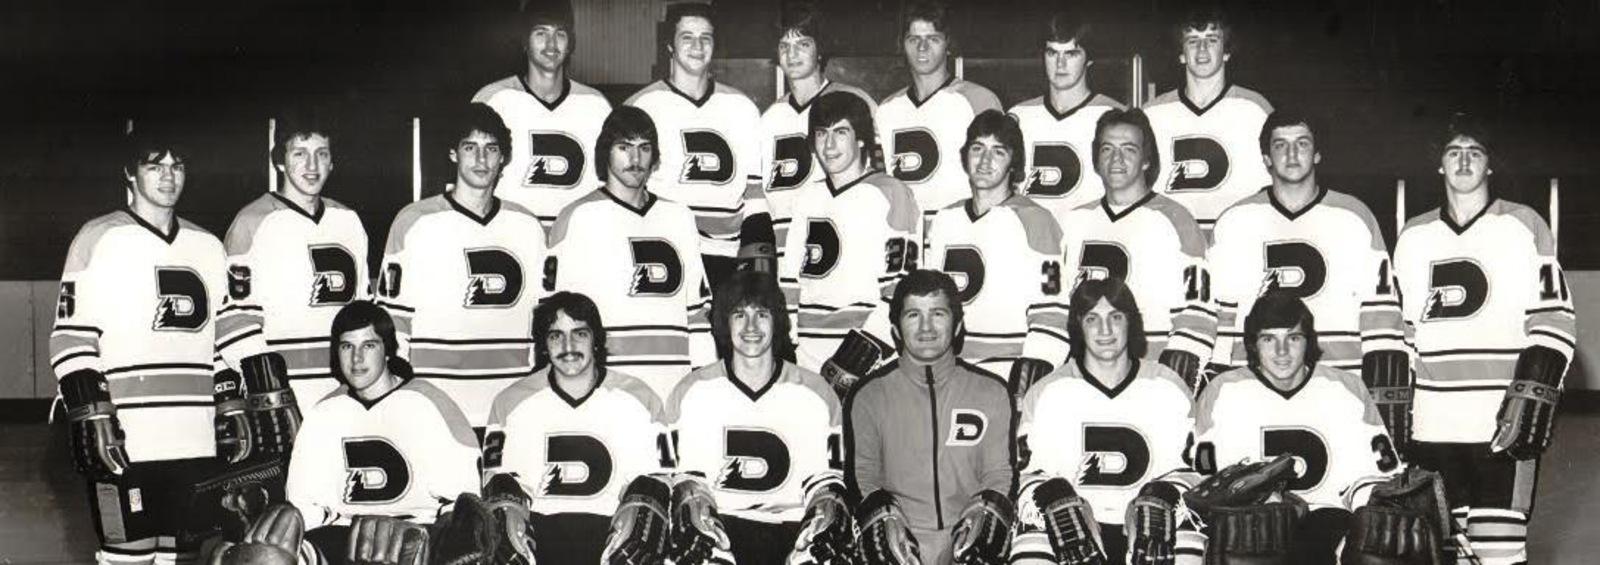 L'édition 1977-1978 des Dynamos de Shawinigan